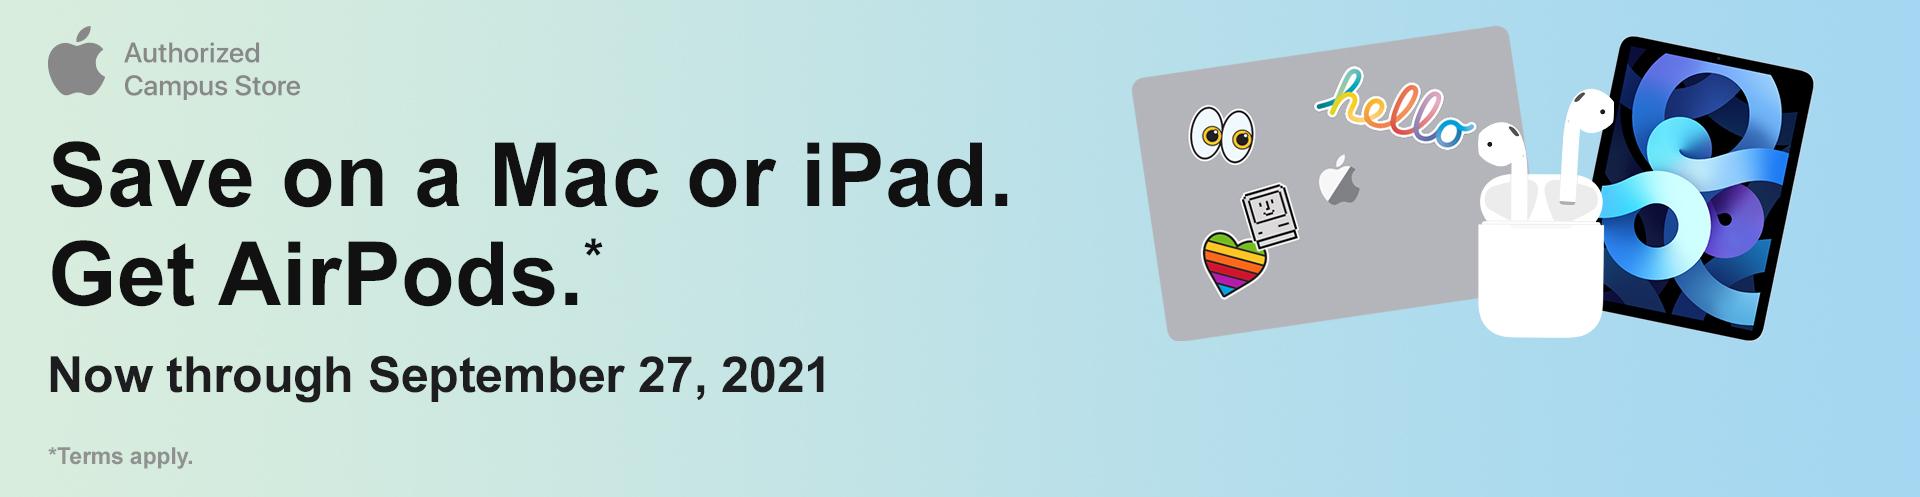 Shop Macs and iPads